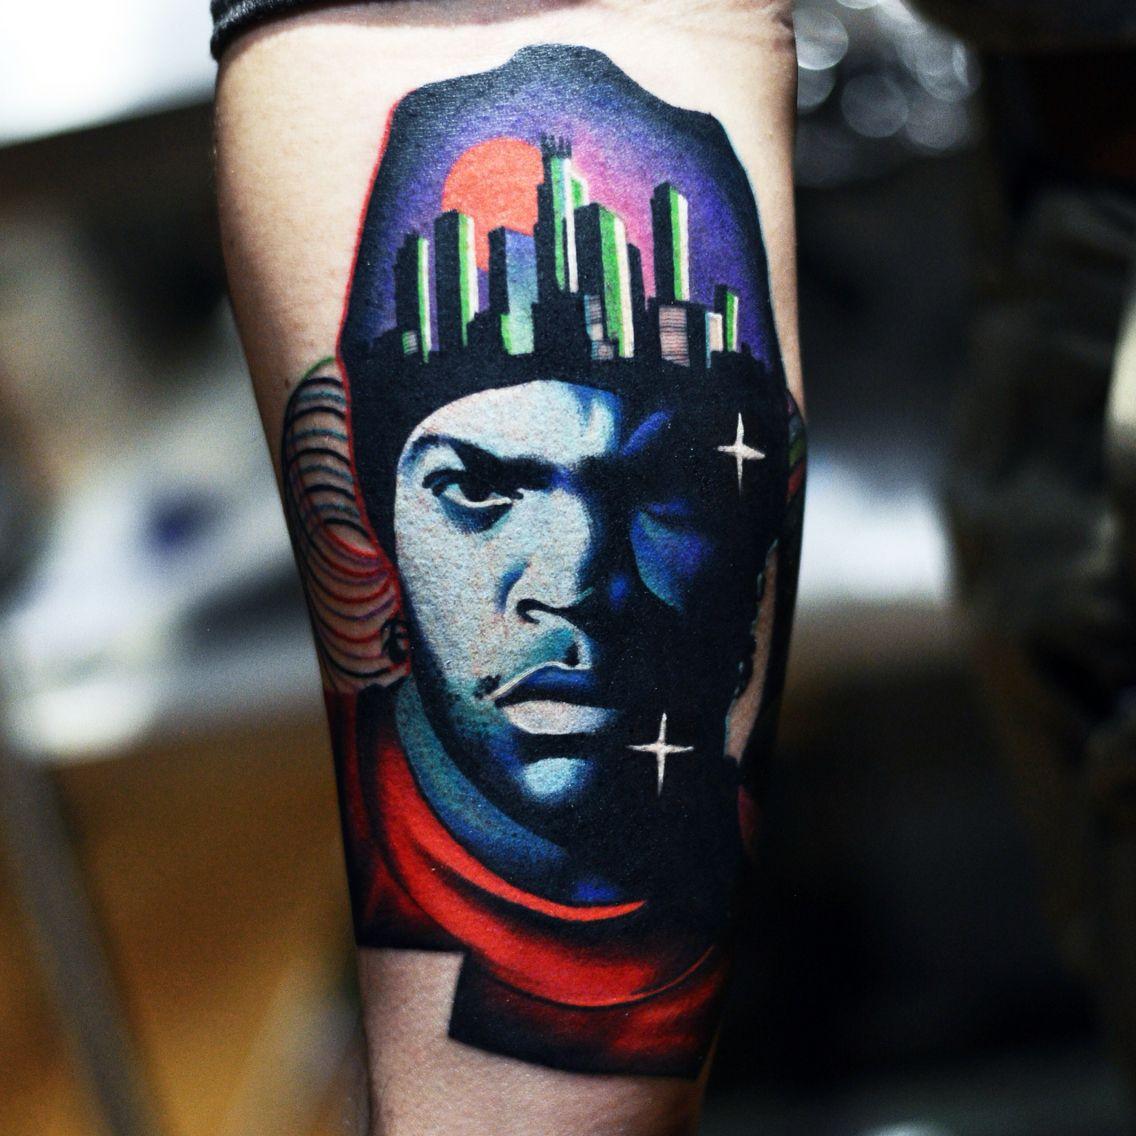 Ice cube tattoo by david cote tattoo art pinterest for East coast tattoo body piercing